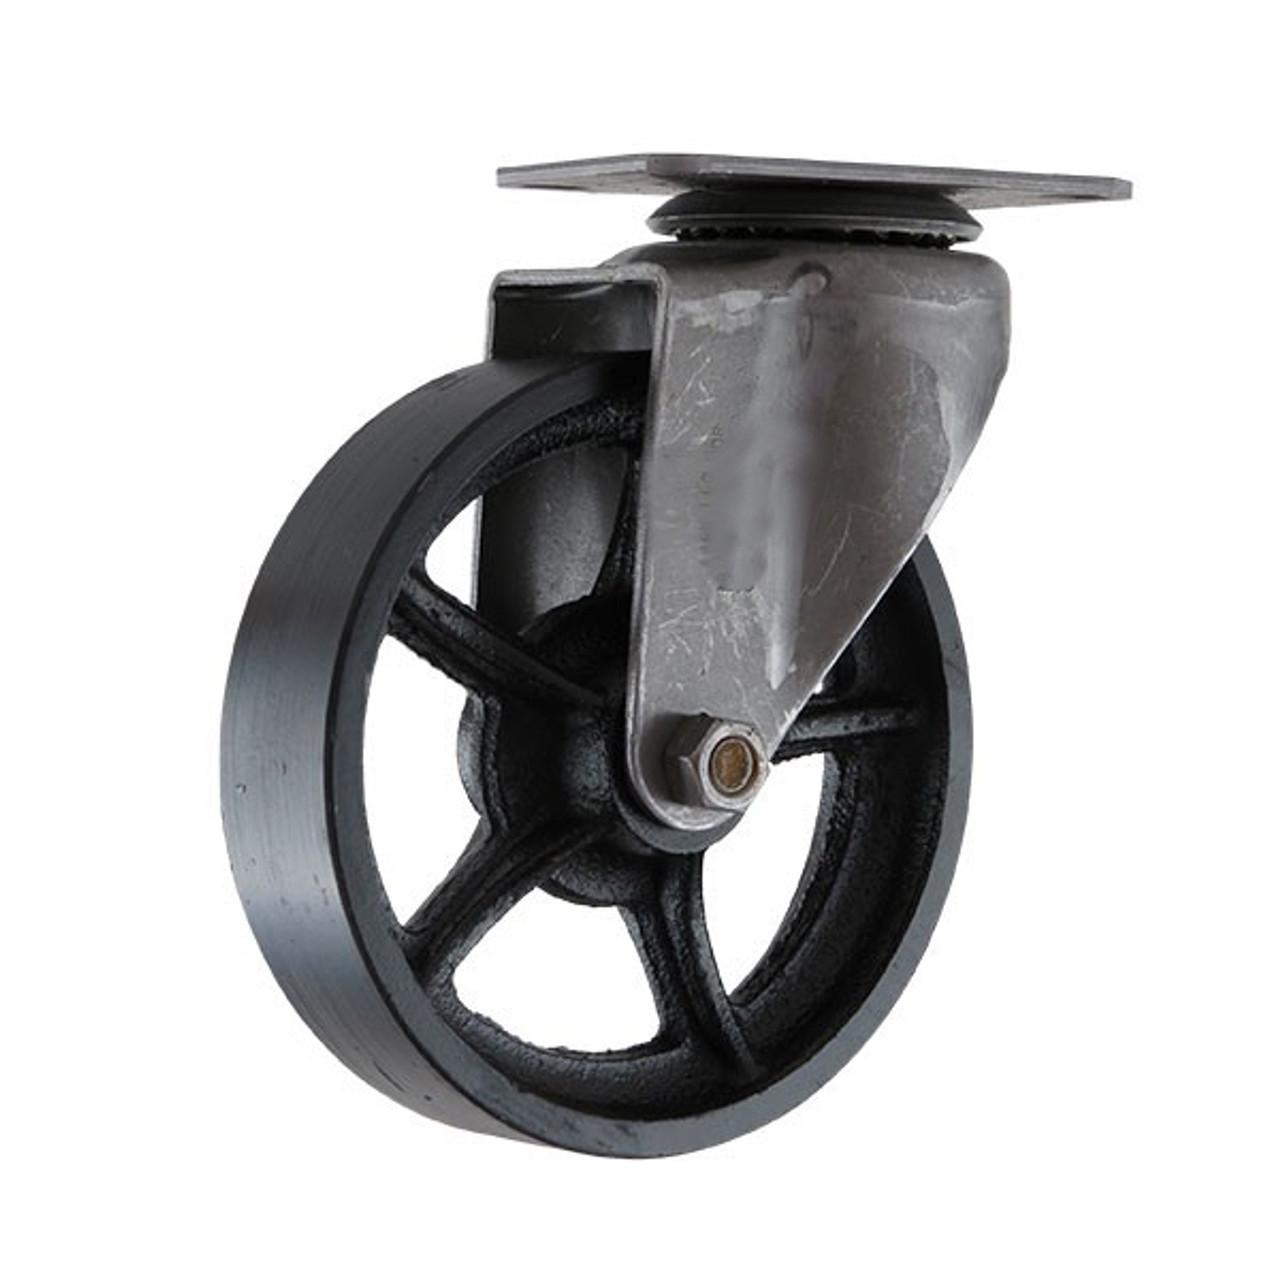 Industrial Vintage Caster Cast Iron Swivel